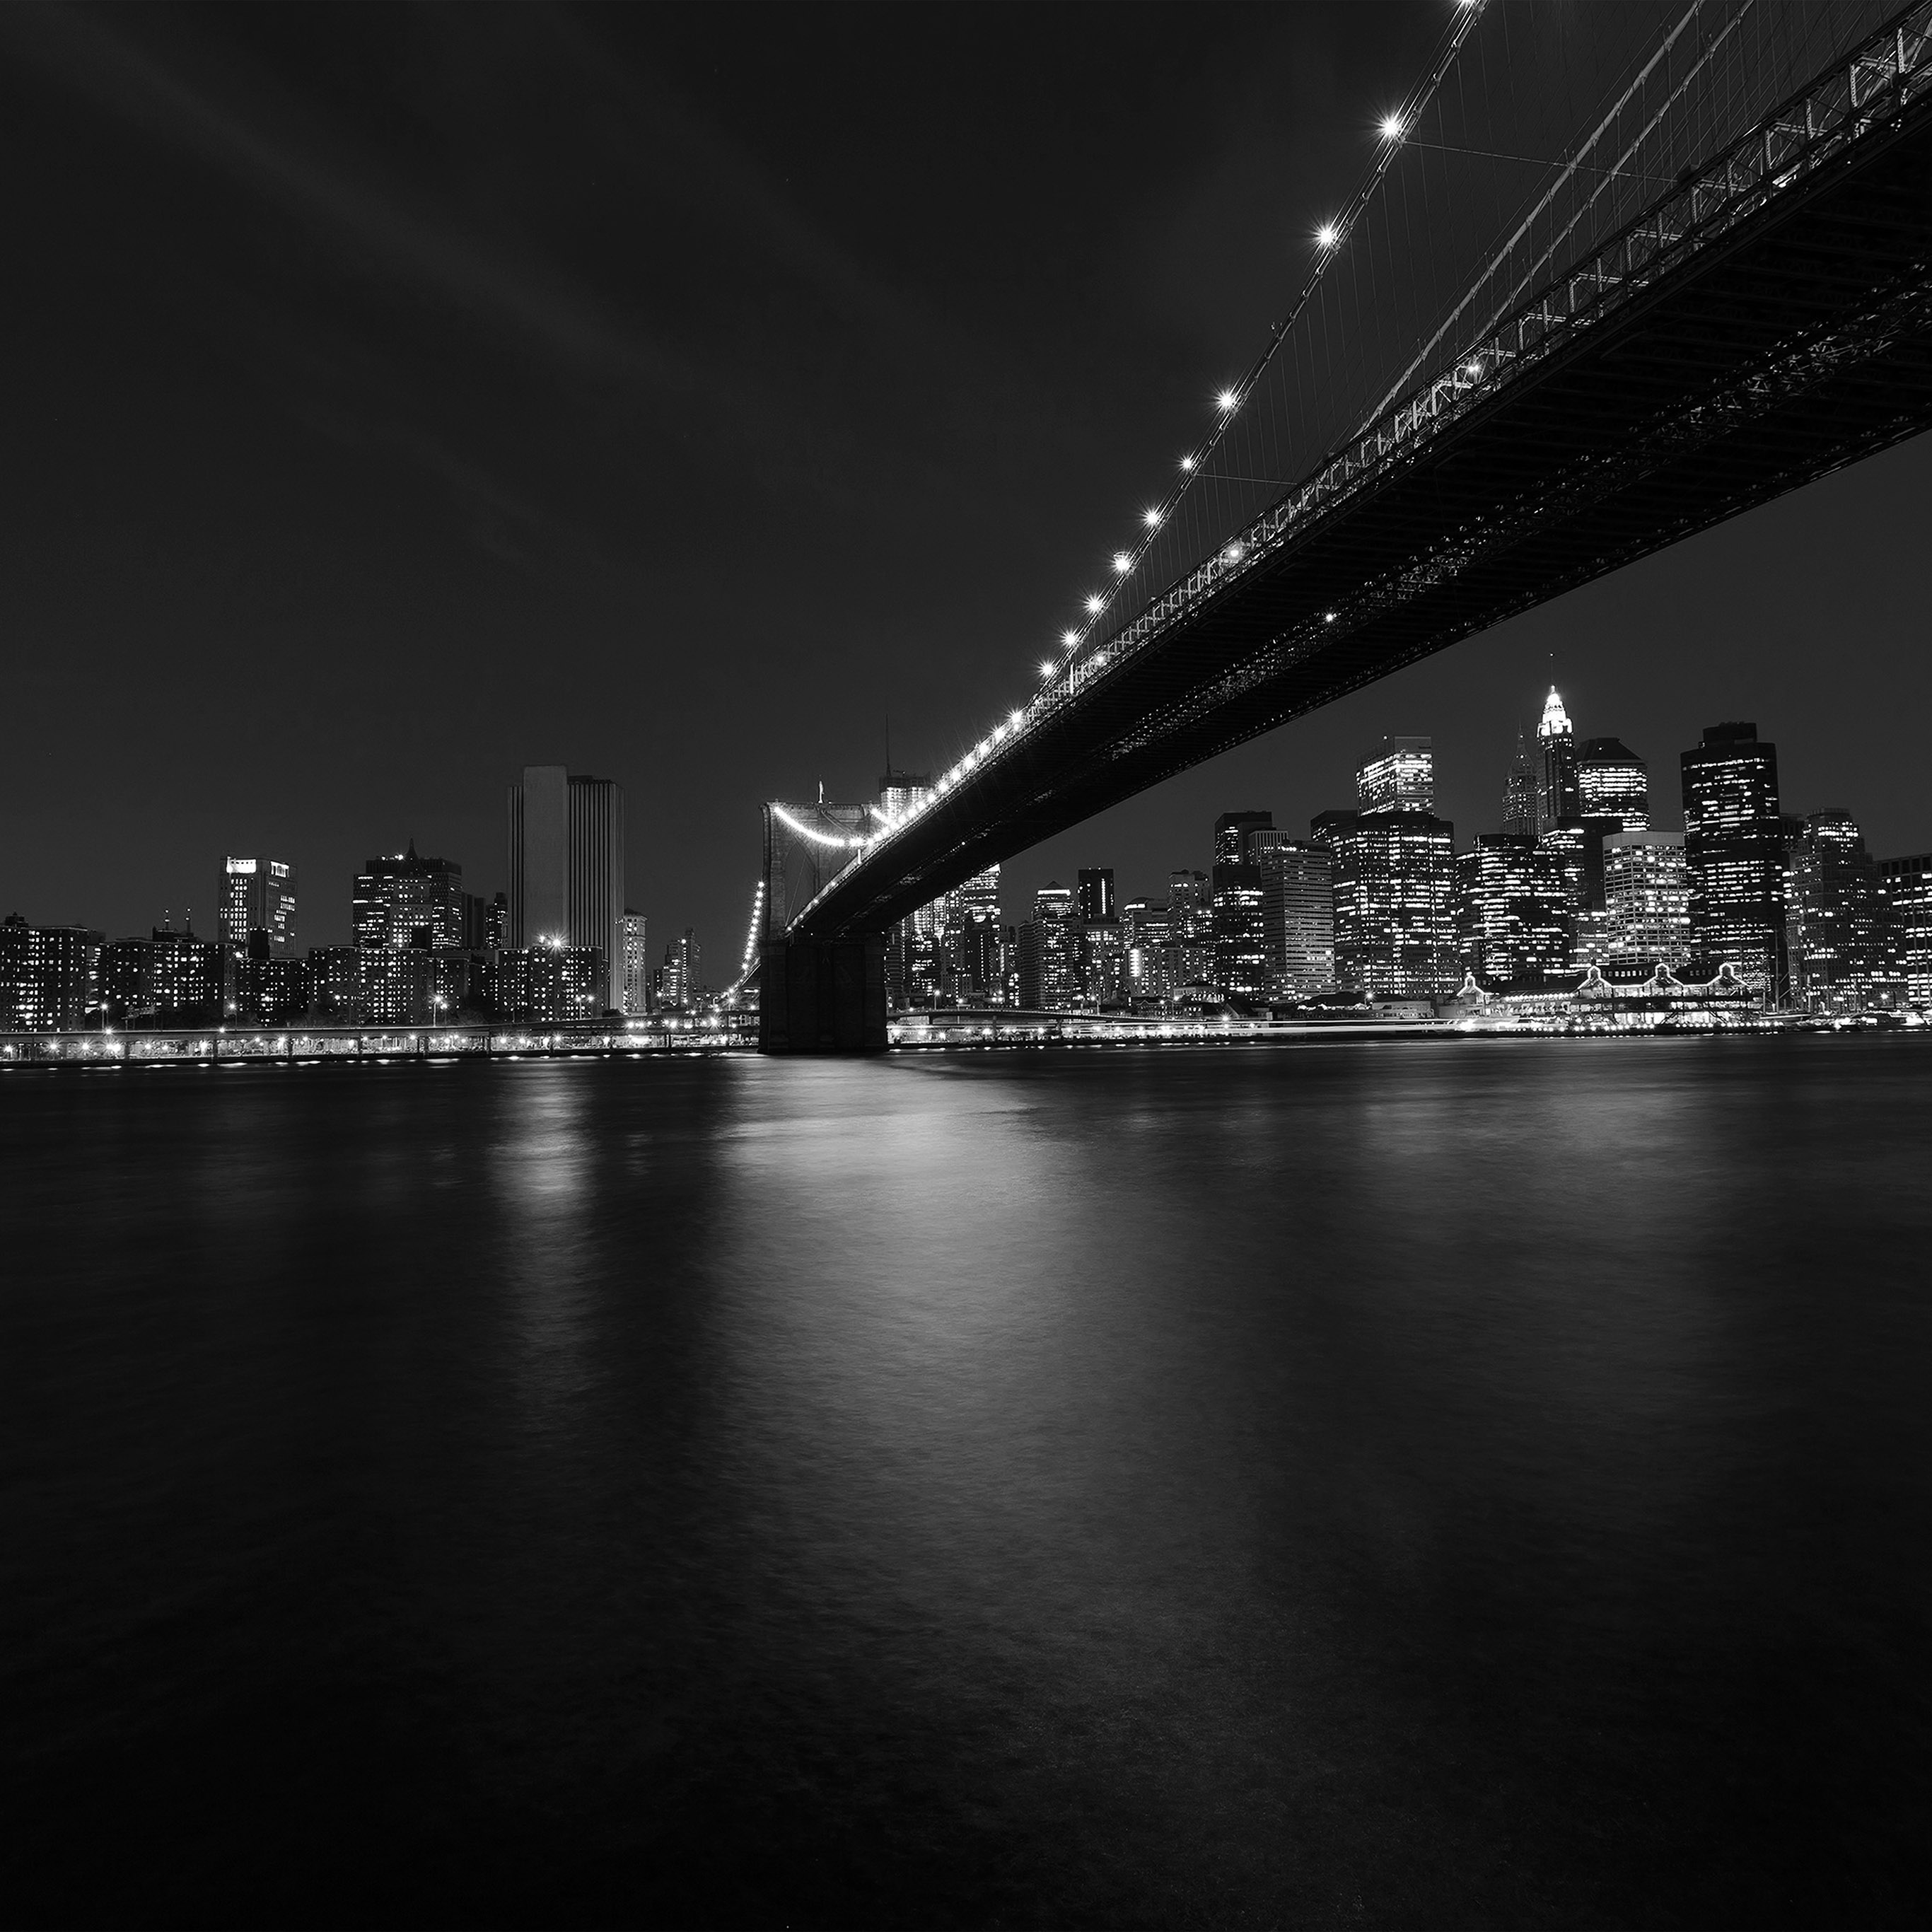 My05-city-night-river-view-nature-dark-bw-black-wallpaper